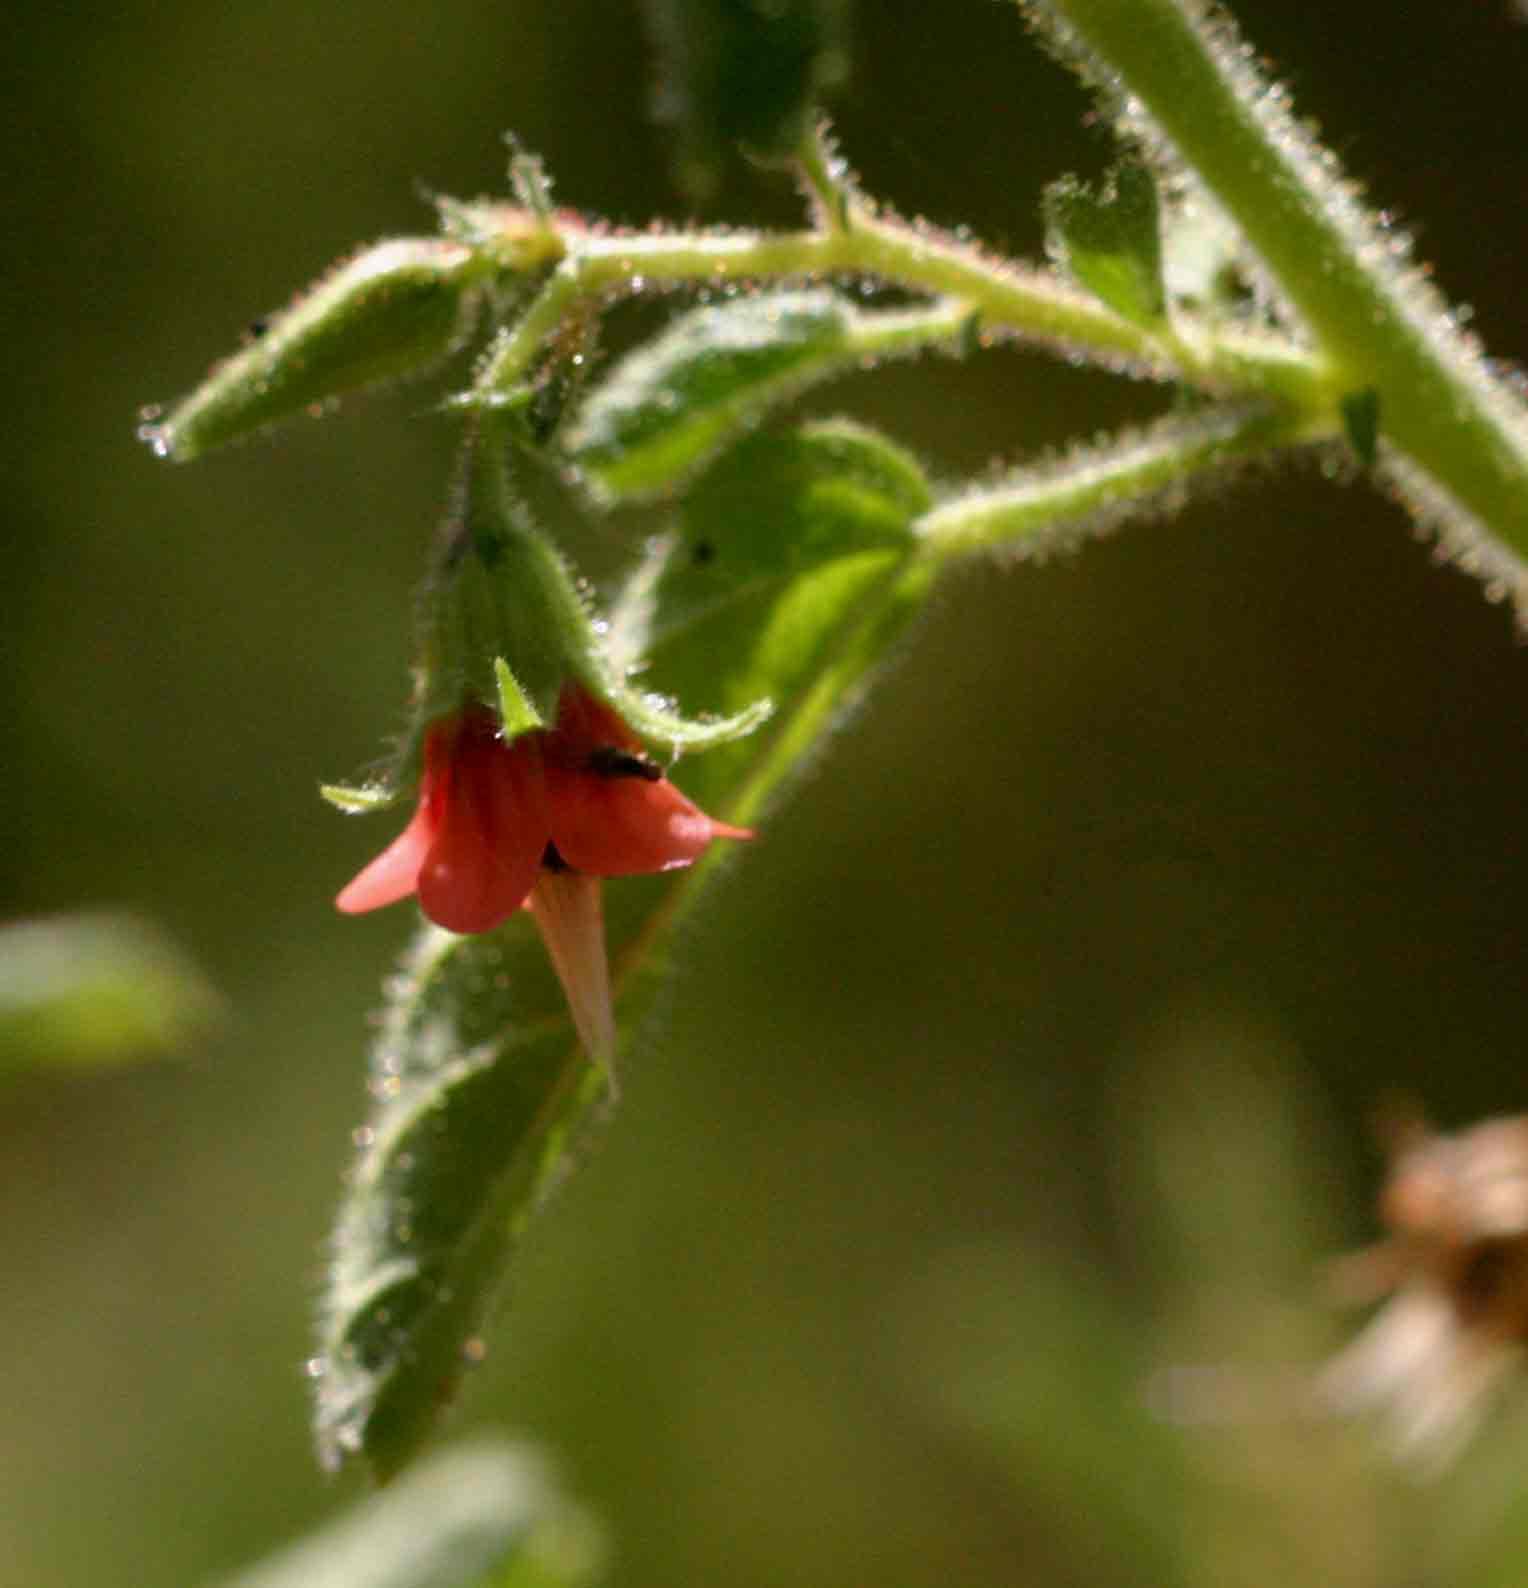 Hermannia glanduligera